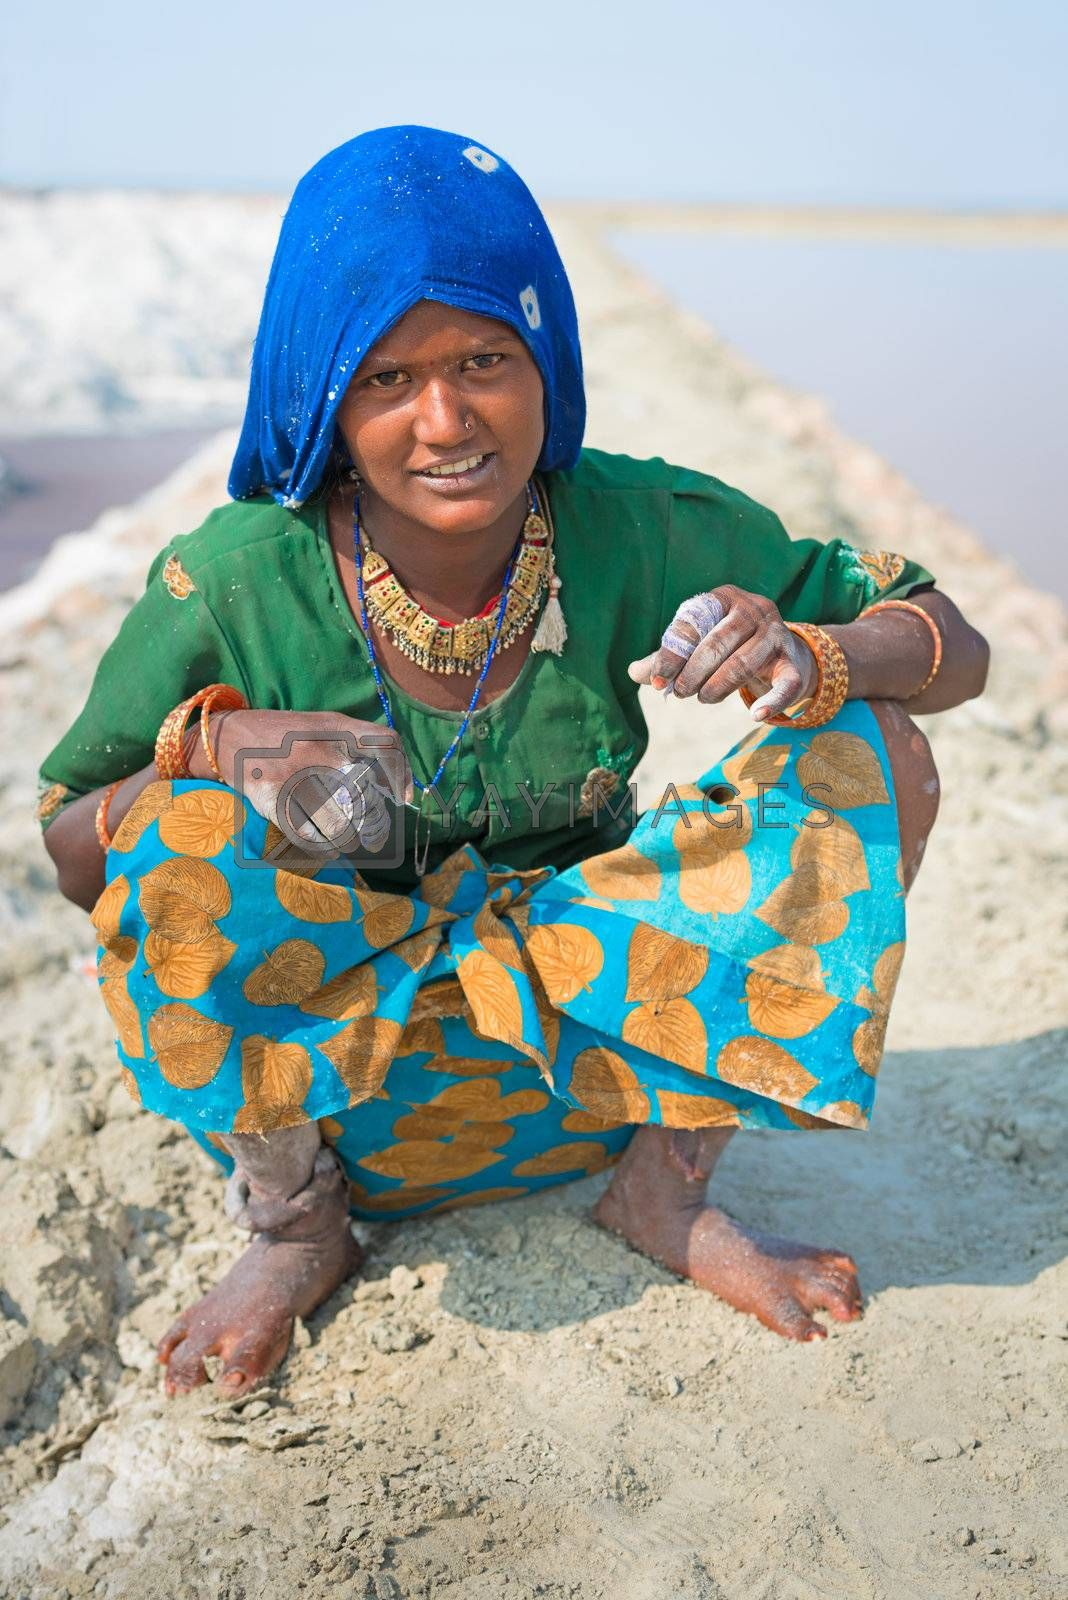 Sambhar, India - Nov 19: Portrait of indian female worker in salt farm on Nov 19, 2012 in Sambhar Salt Lake, India. It is India's largest saline lake, where salt has been farmed for a thousand years.